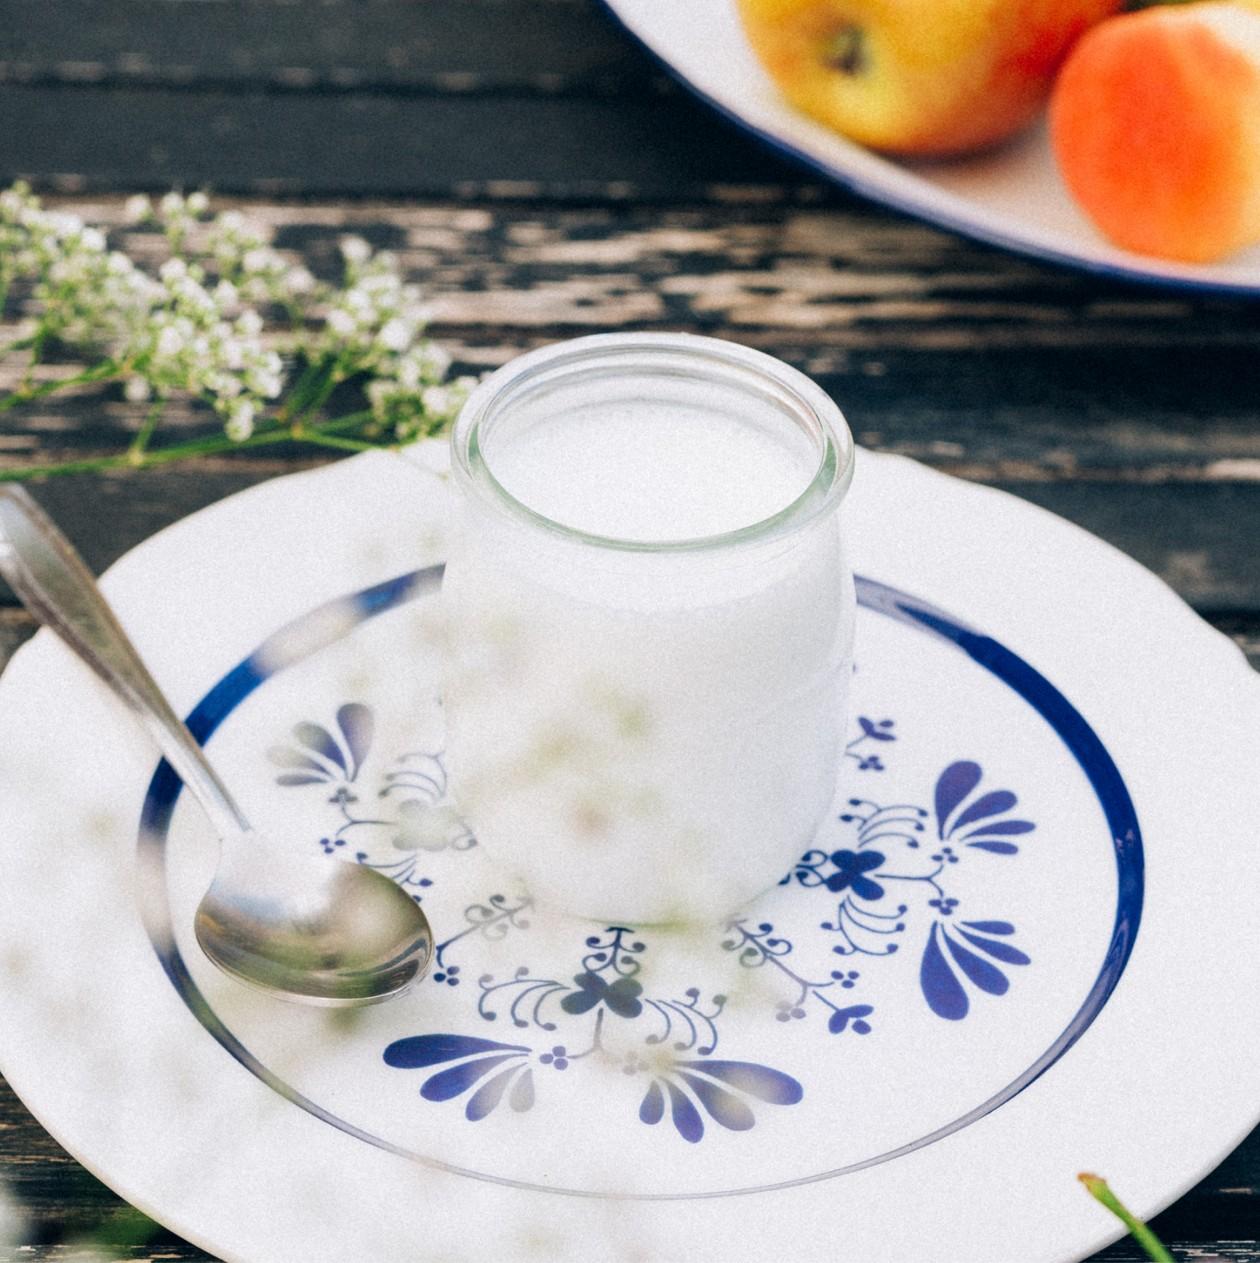 La importancia de la leche